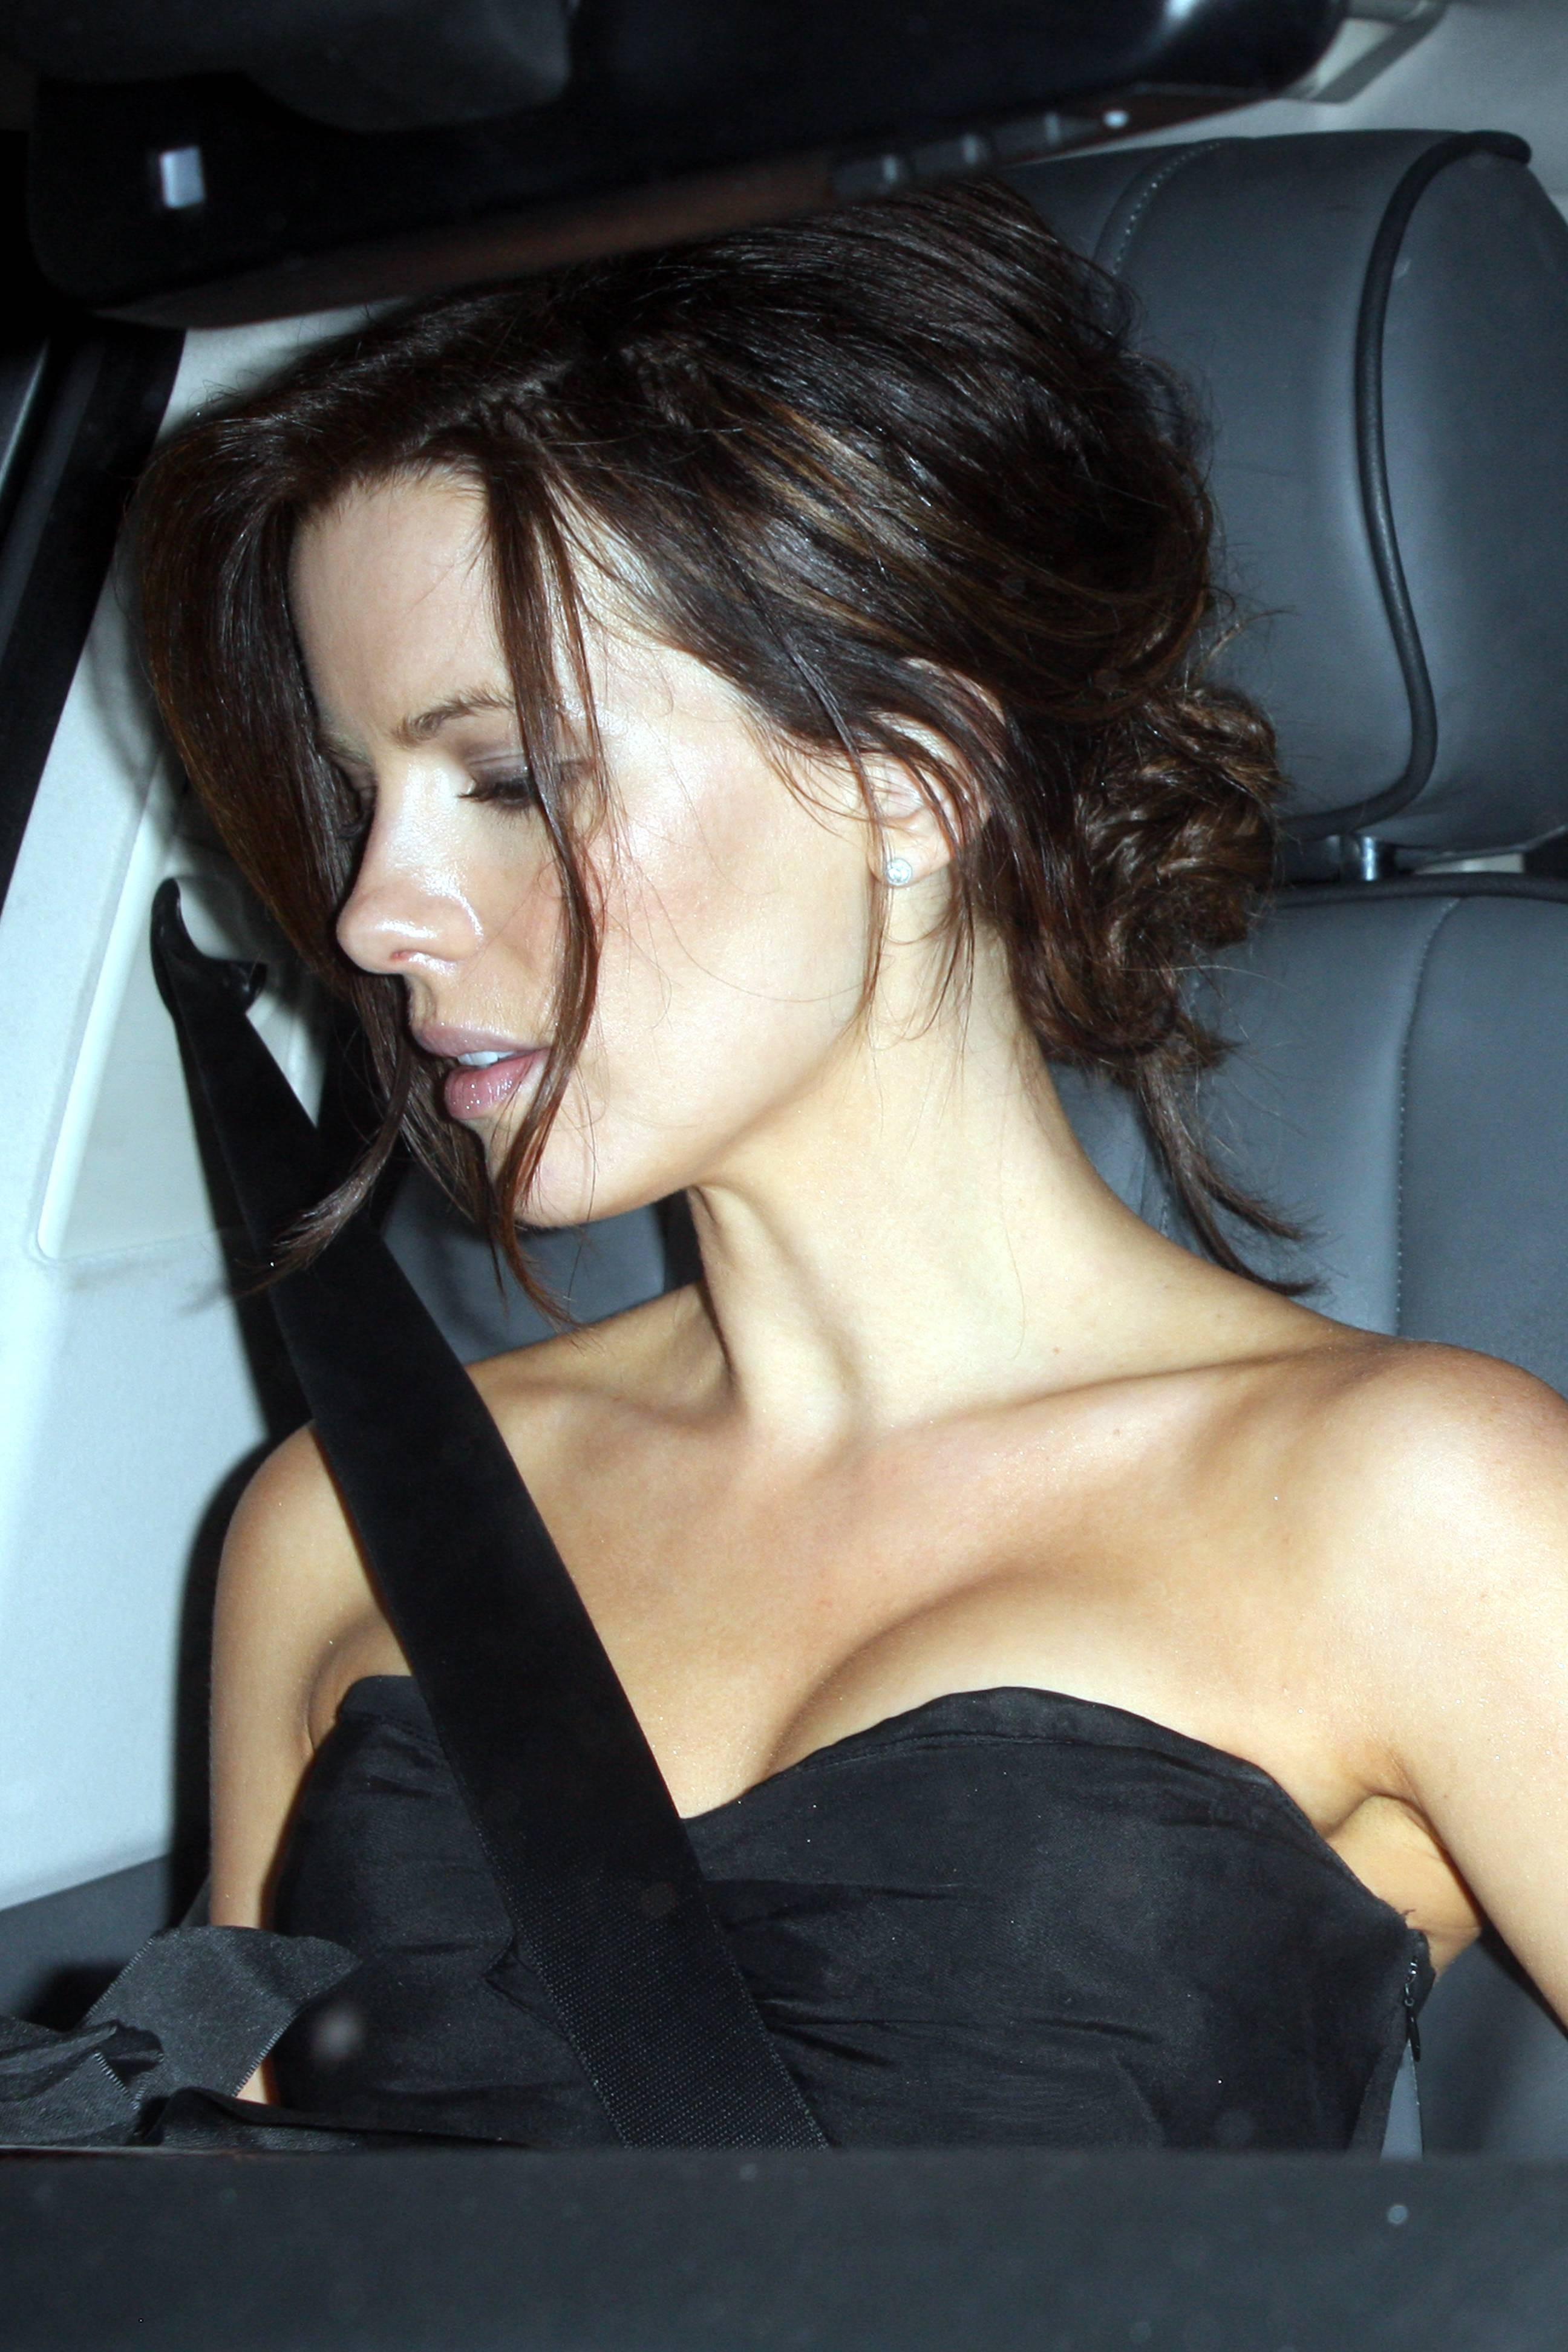 fe595b423ed4 black model long hair glasses black hair fashion hair mouth Kate Beckinsale  Person clothing supermodel girl